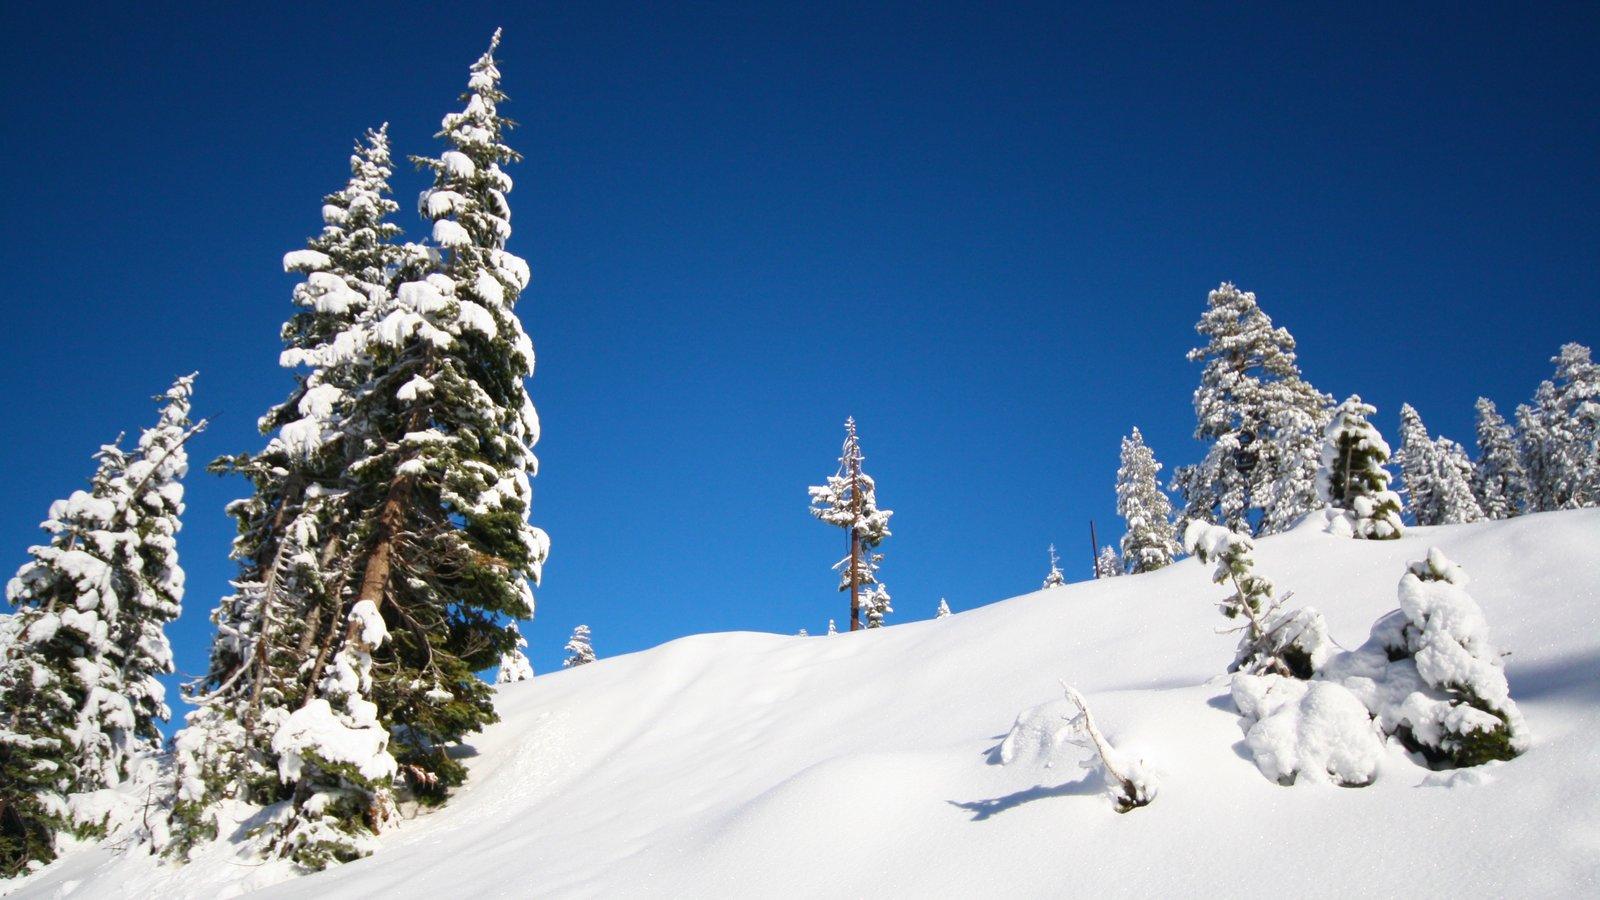 Yosemite Valley caracterizando neve